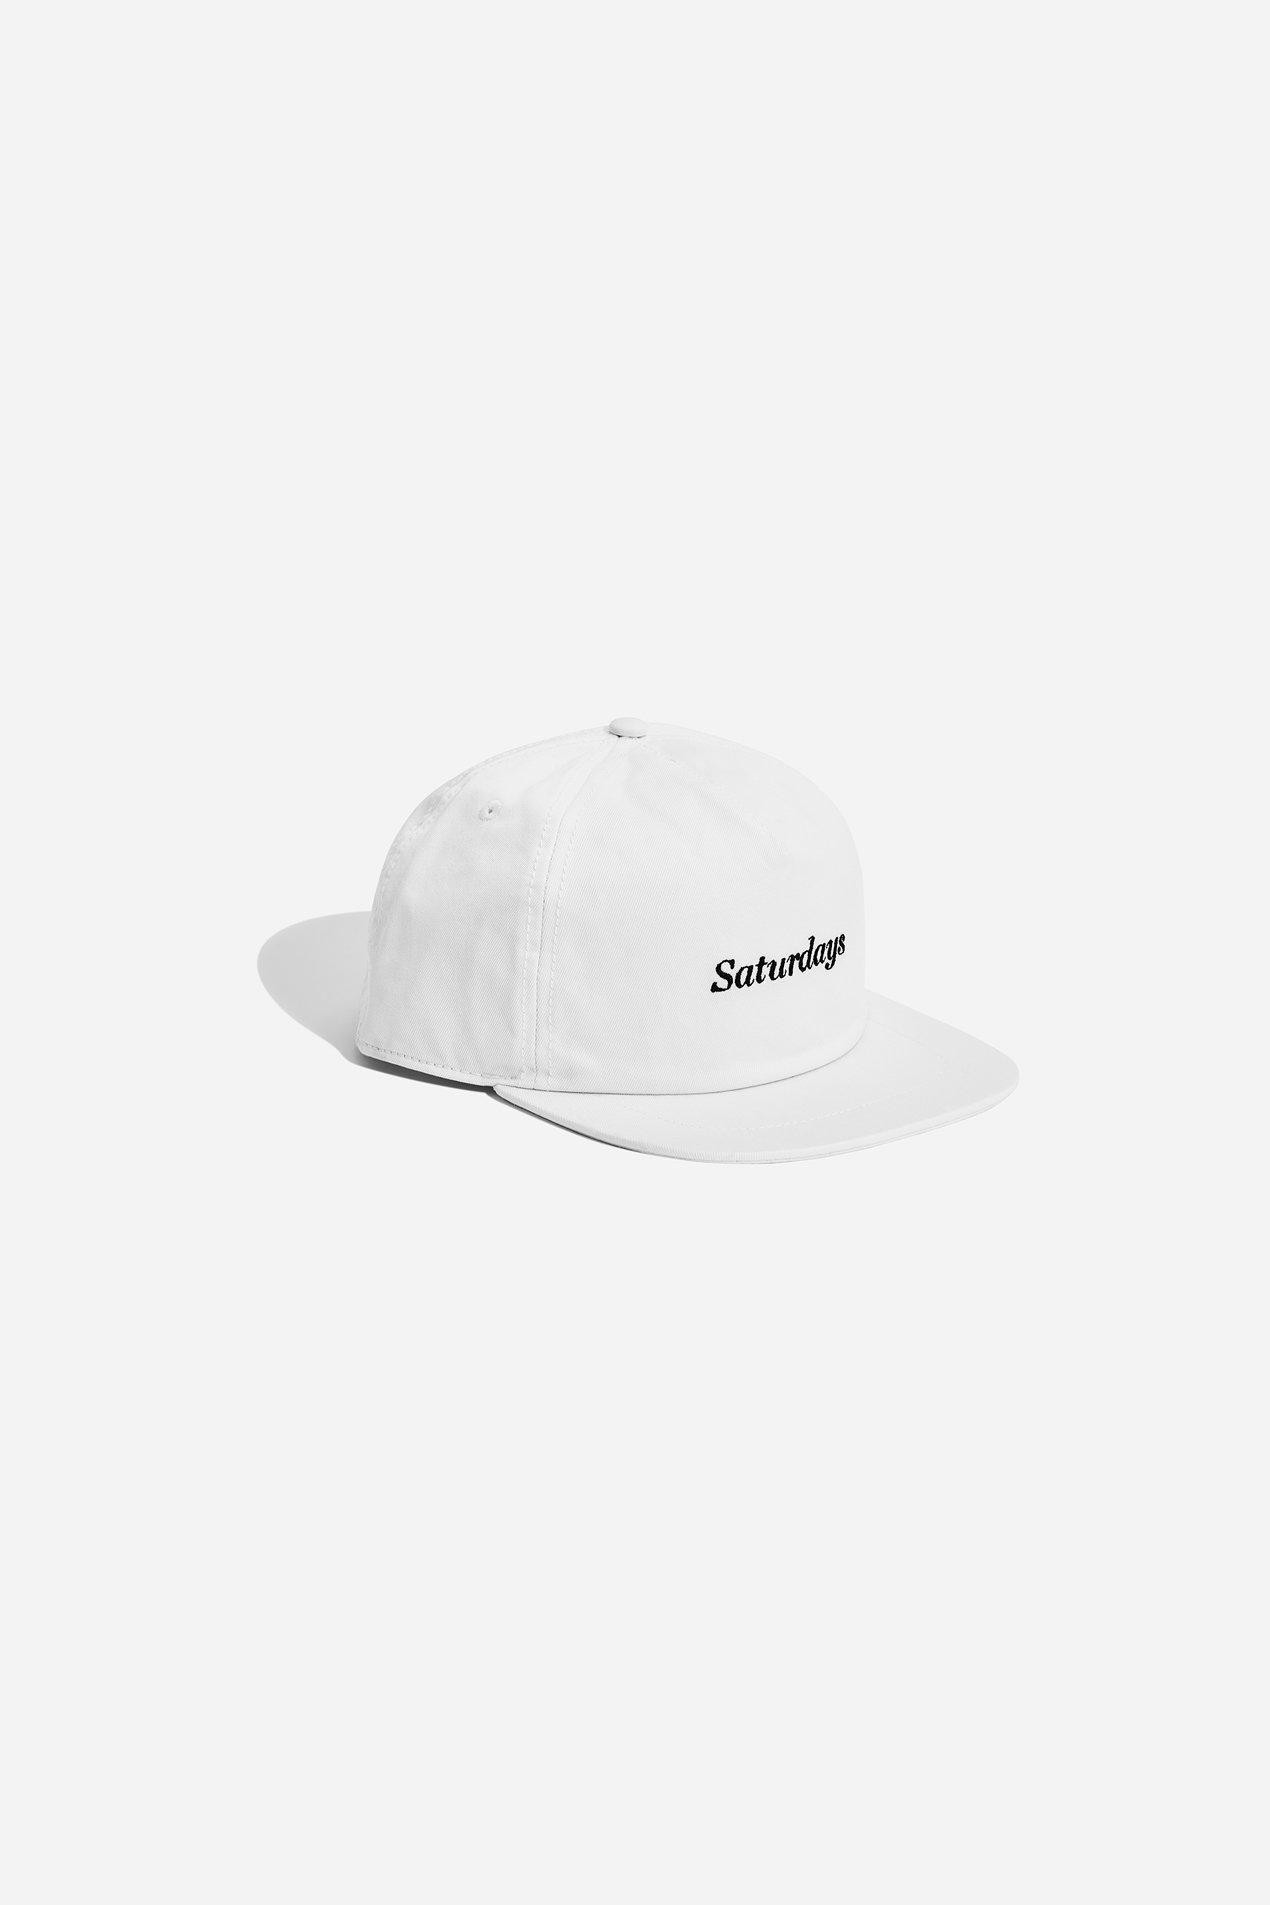 Lyst - Saturdays NYC Stanley Italics Hat in White for Men e6e27688c